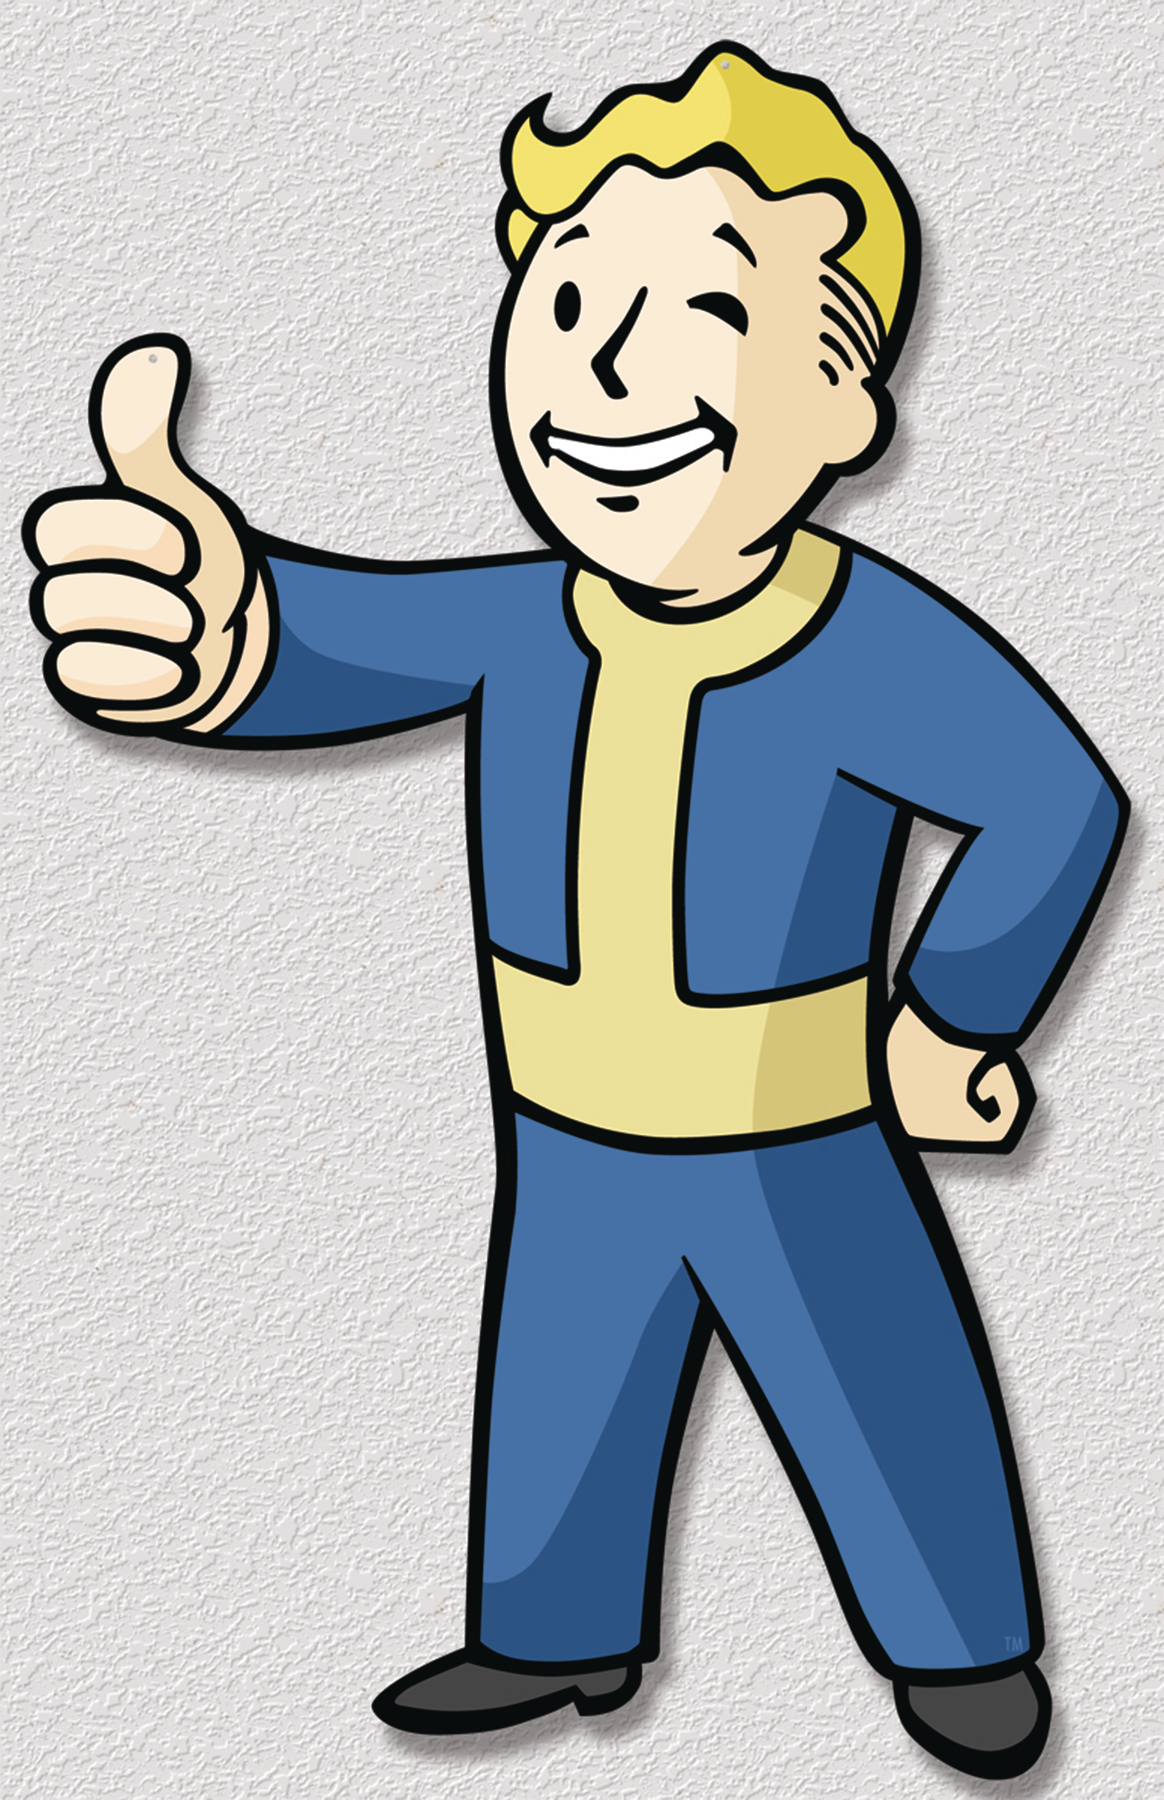 FALLOUT VAULT BOY DIE-CUT TIN - Fallout Clipart